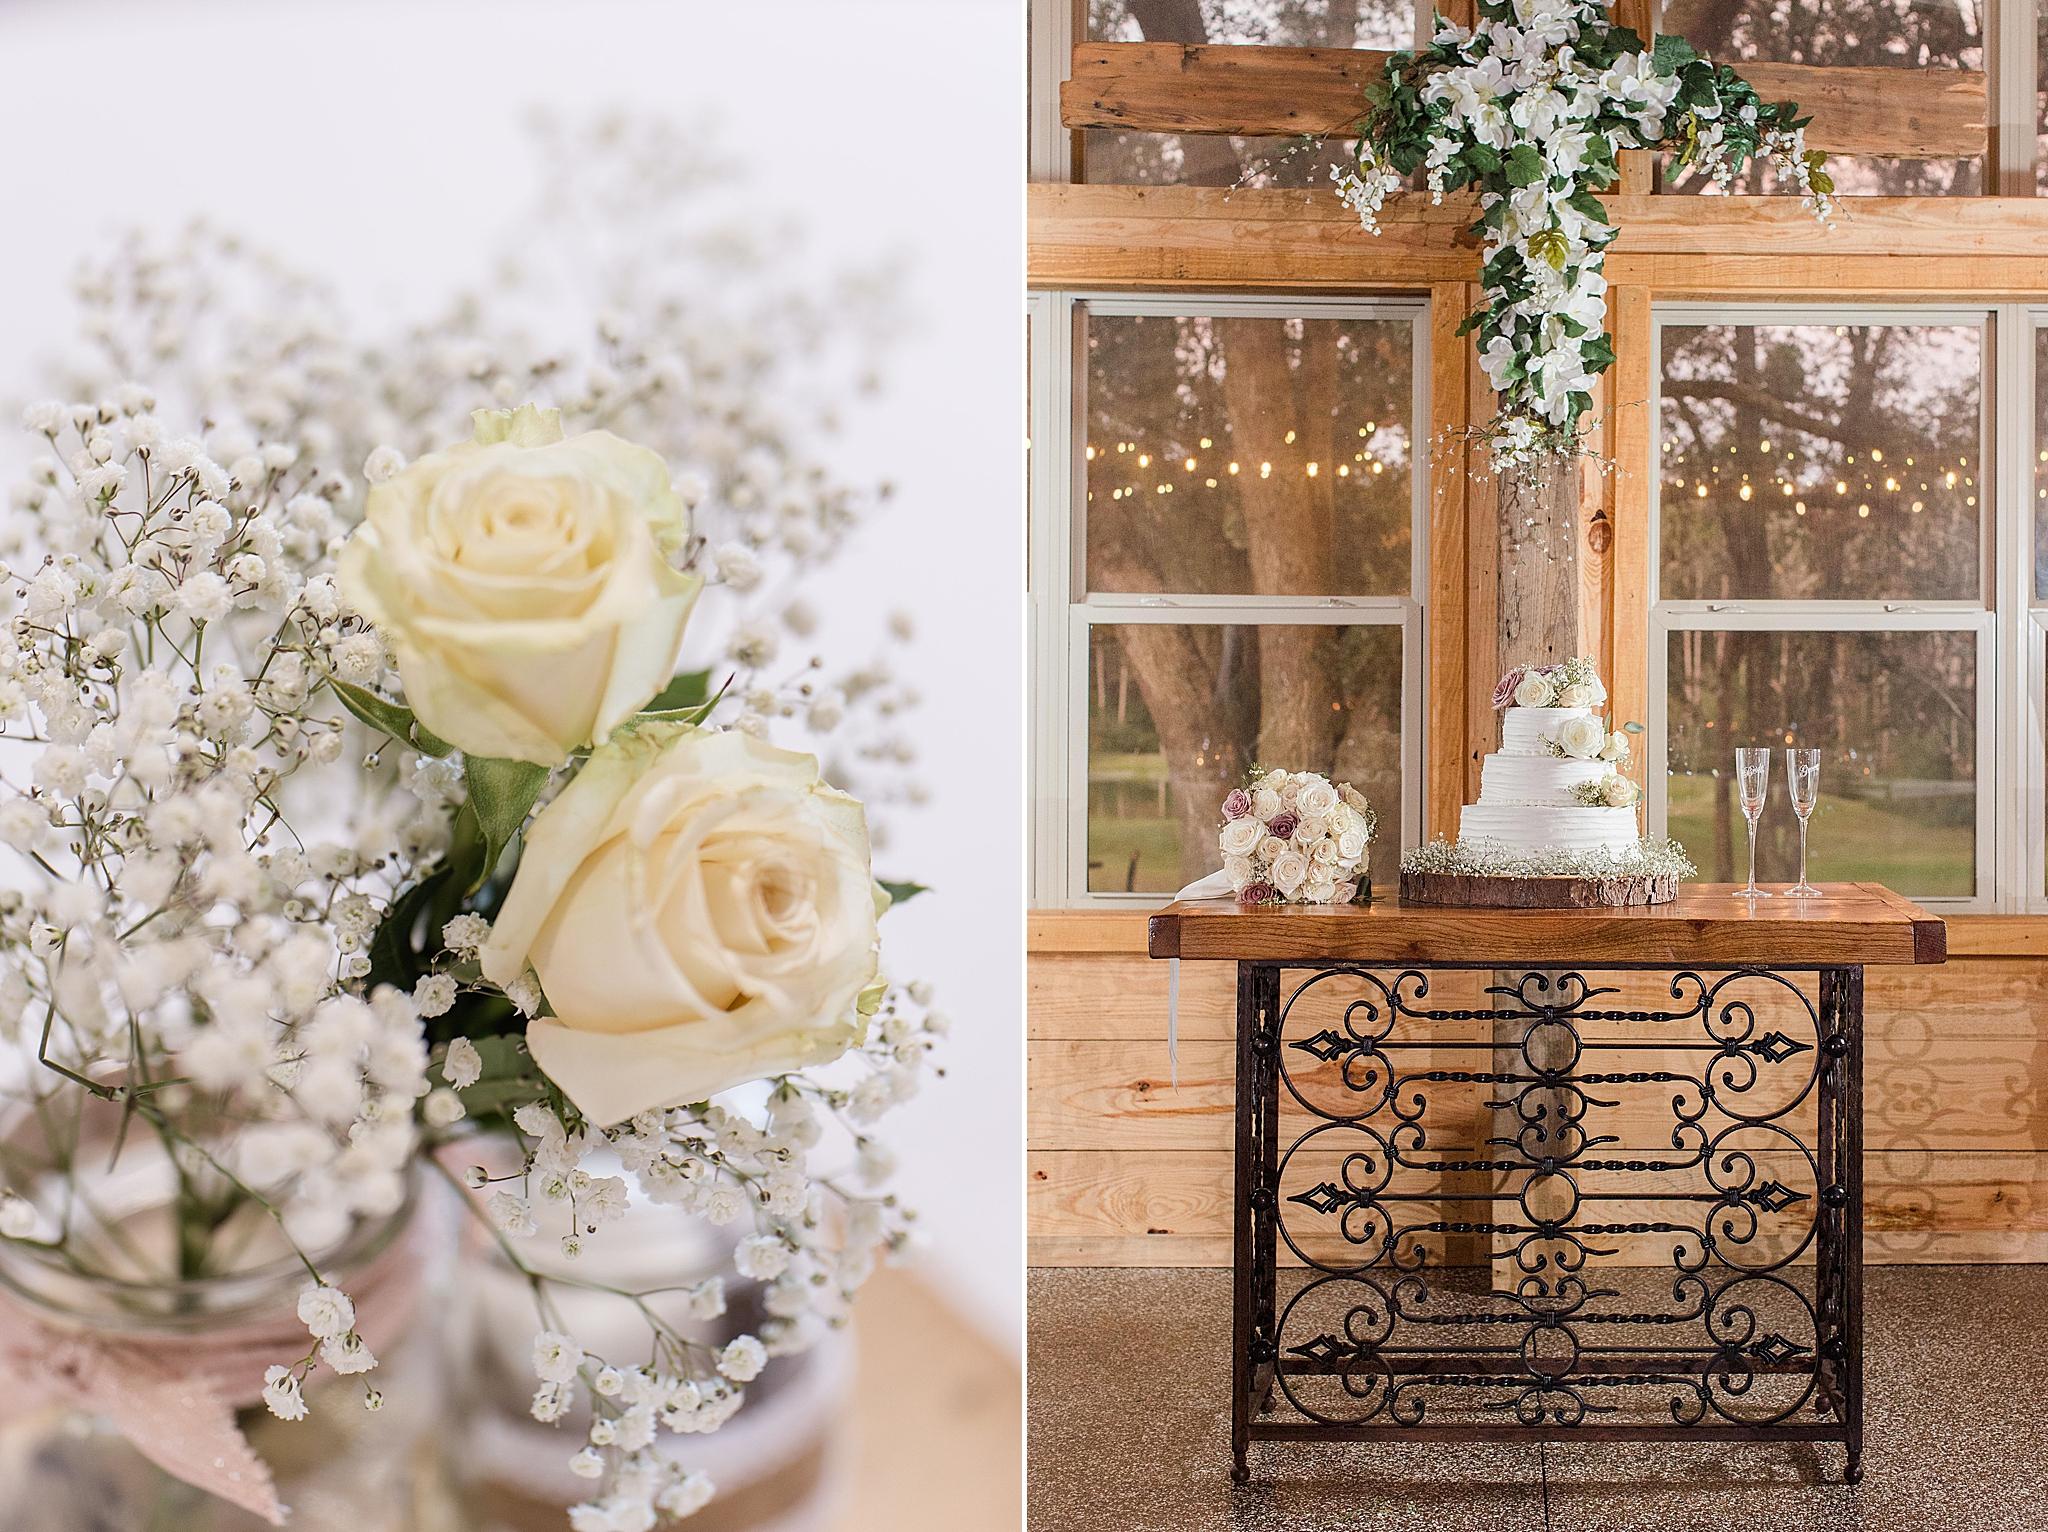 rustic elegant wedding details for Orchard at Hayes Farm wedding